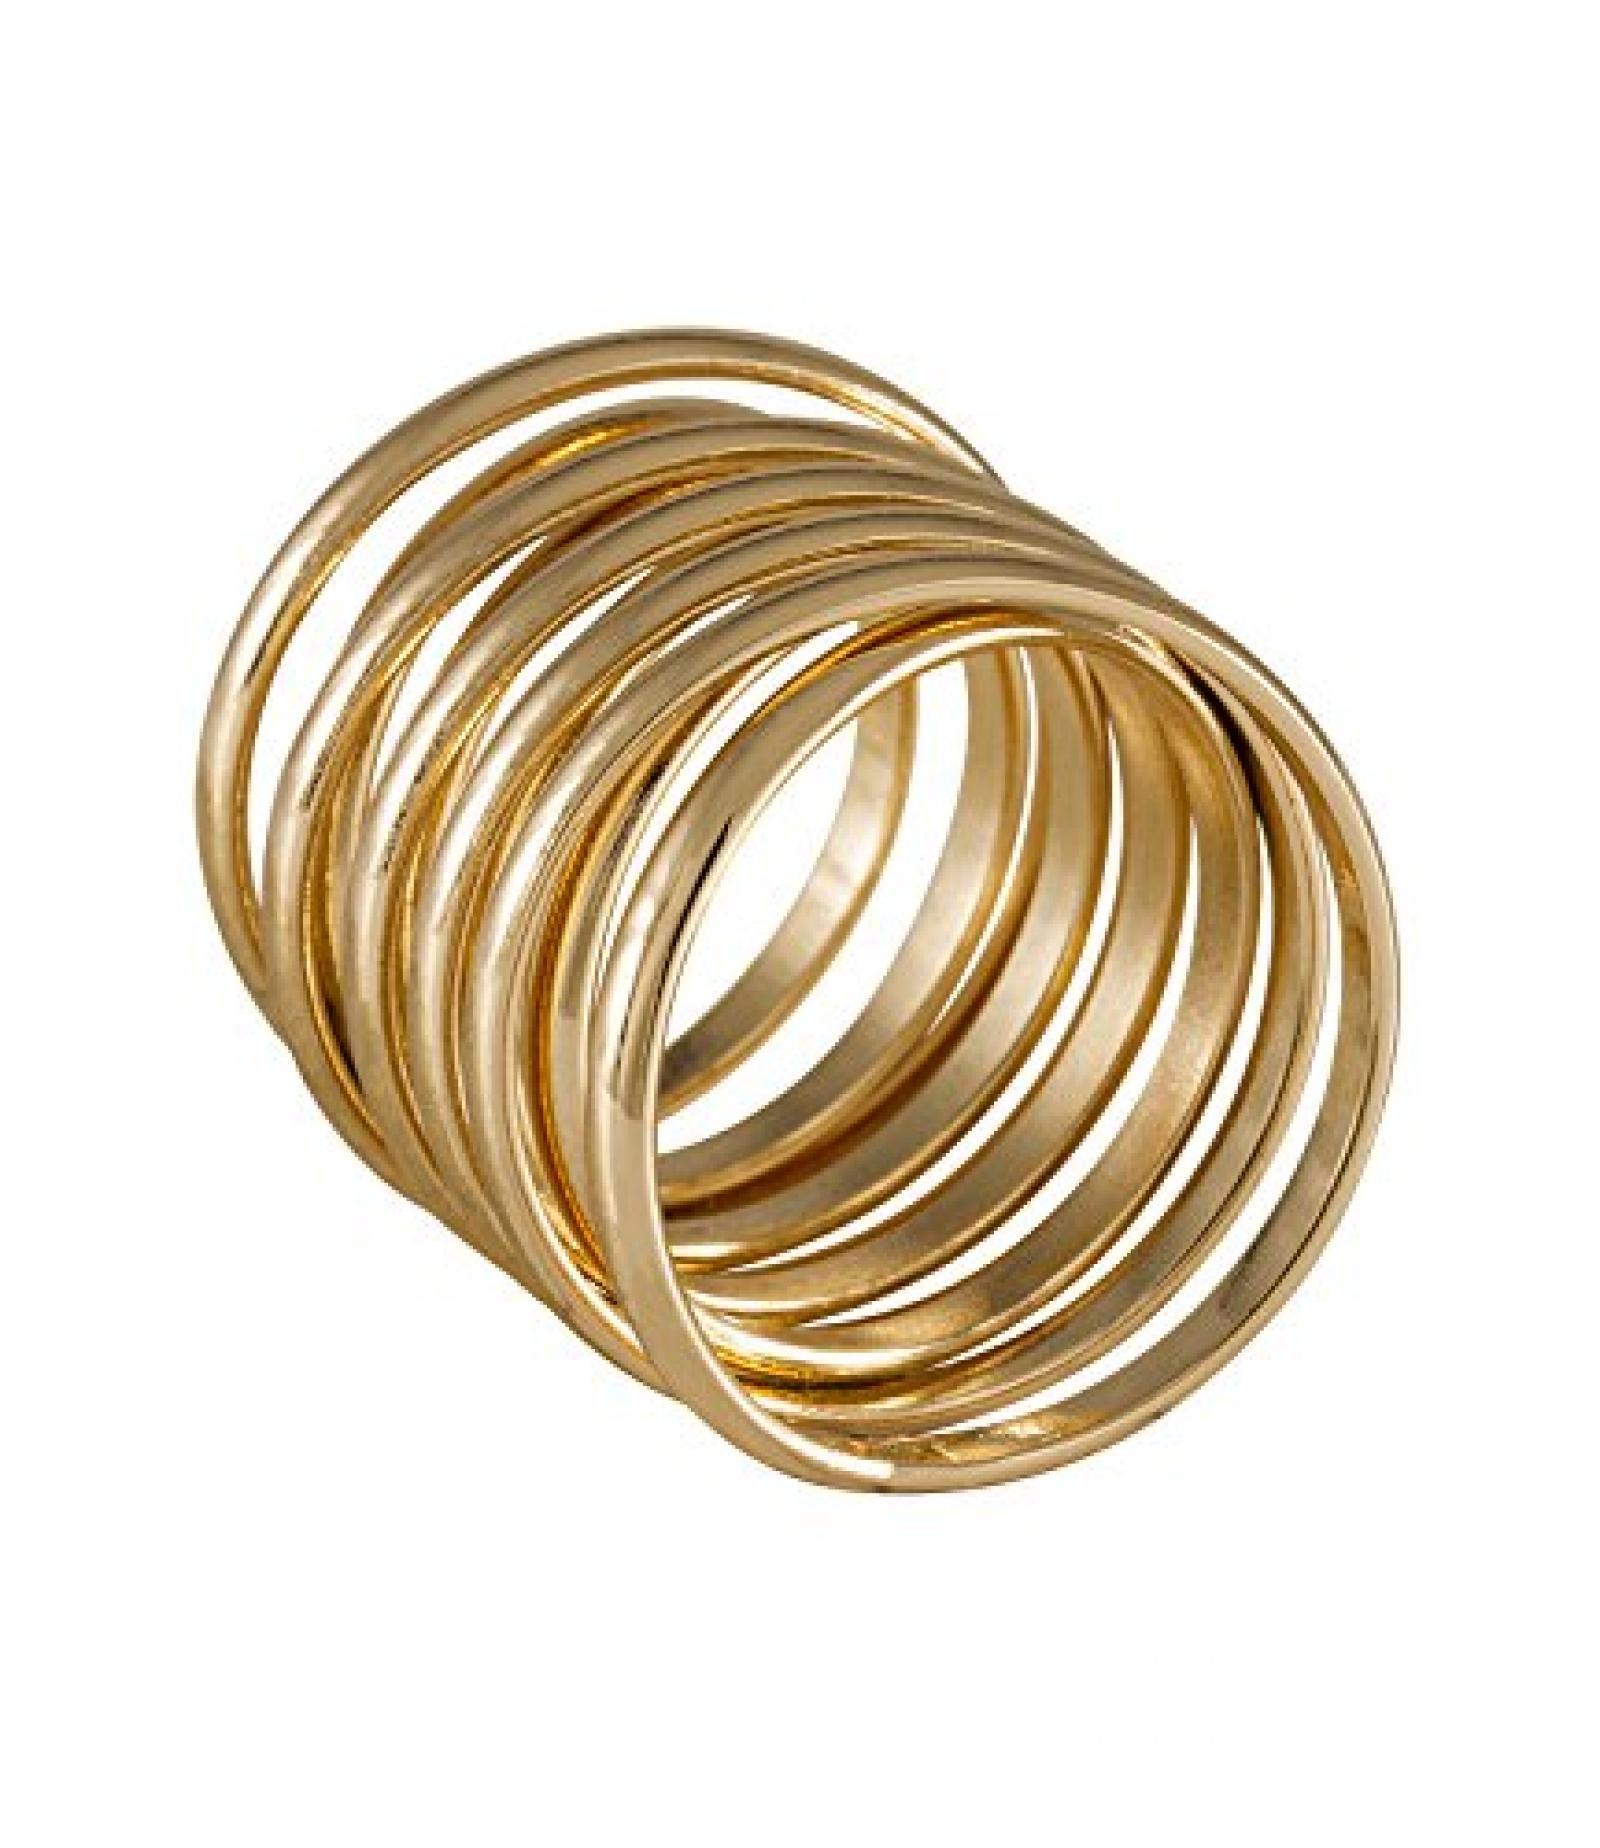 "SIX ""White Summer"" breiter, gedrehter Ring aus goldenem Metall (383-301)"